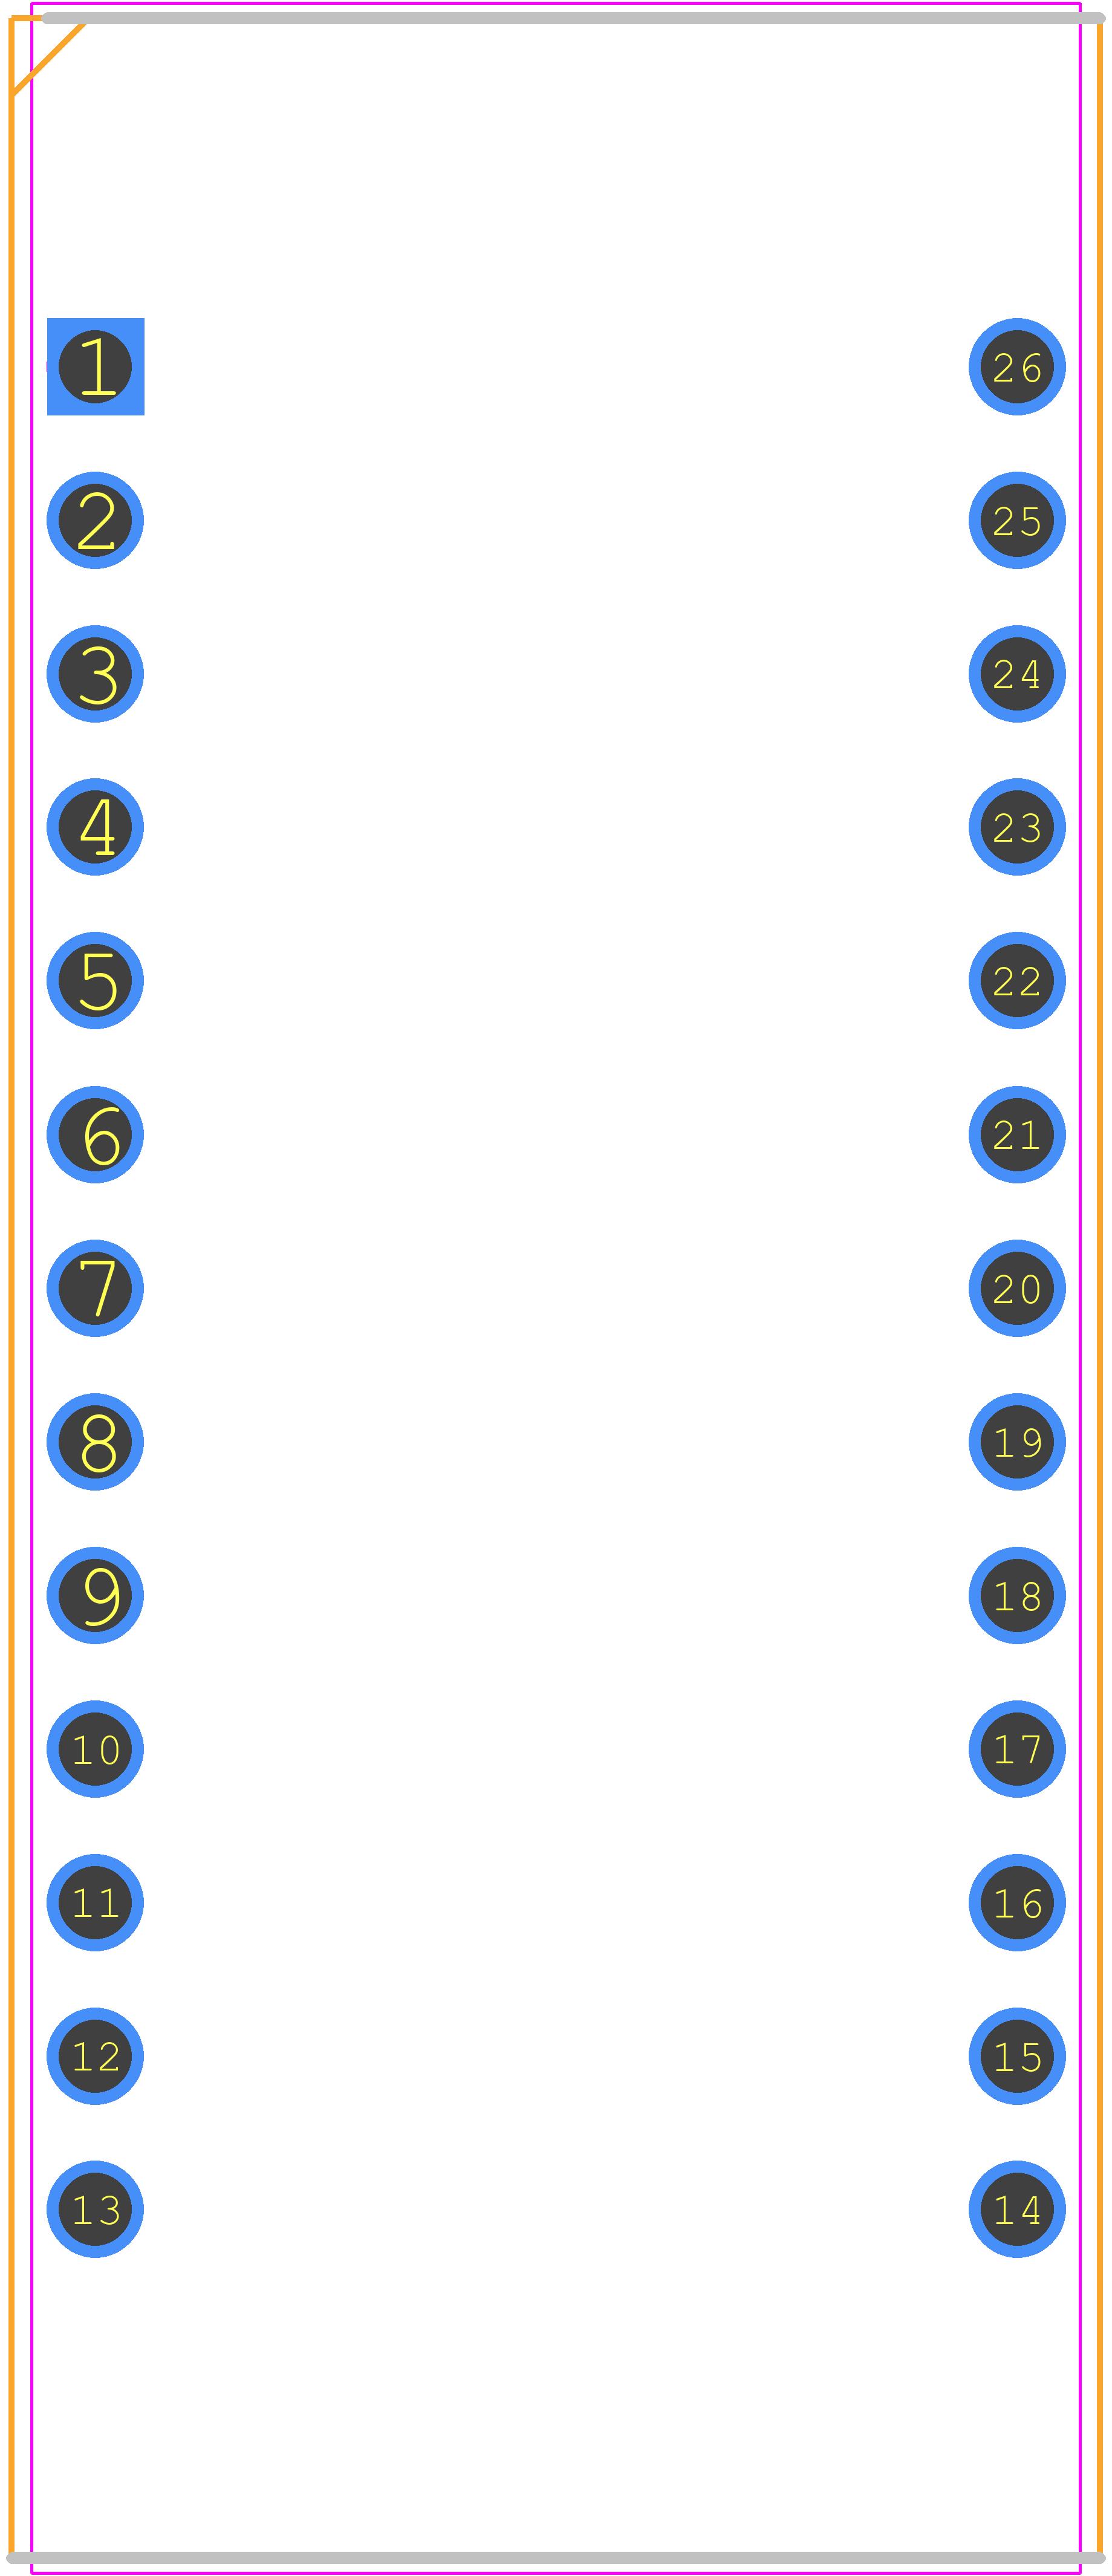 PCB footprint for Adafruit 1602 - Header, Vertical